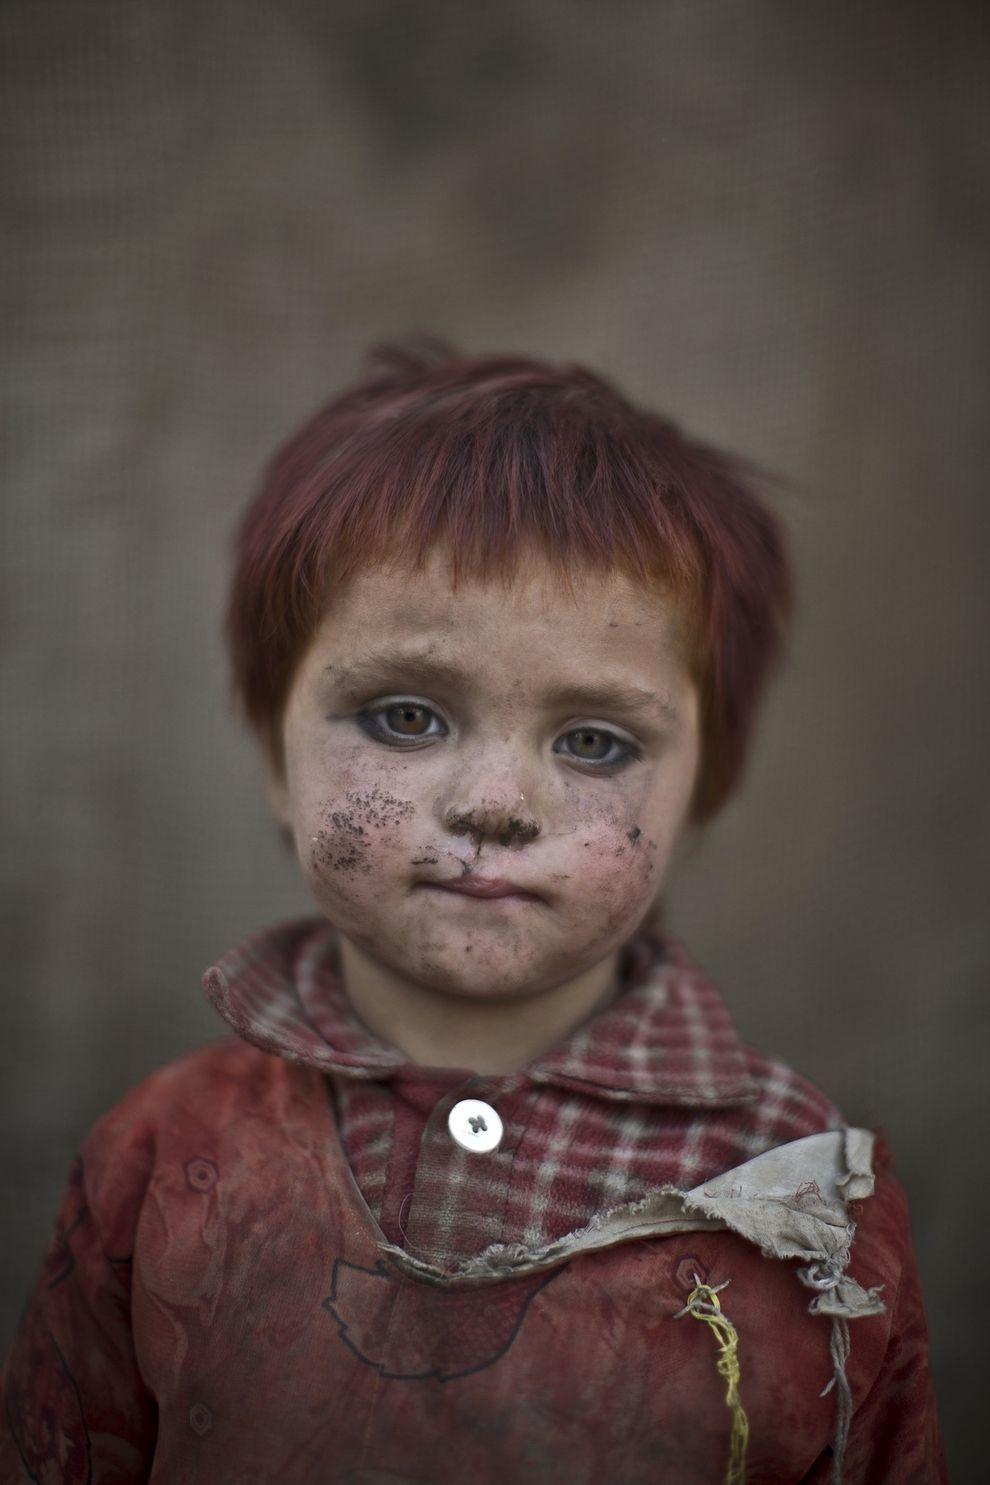 47 Stunning Photographs Of People From Around The World - Muhammed Muheisen / AP